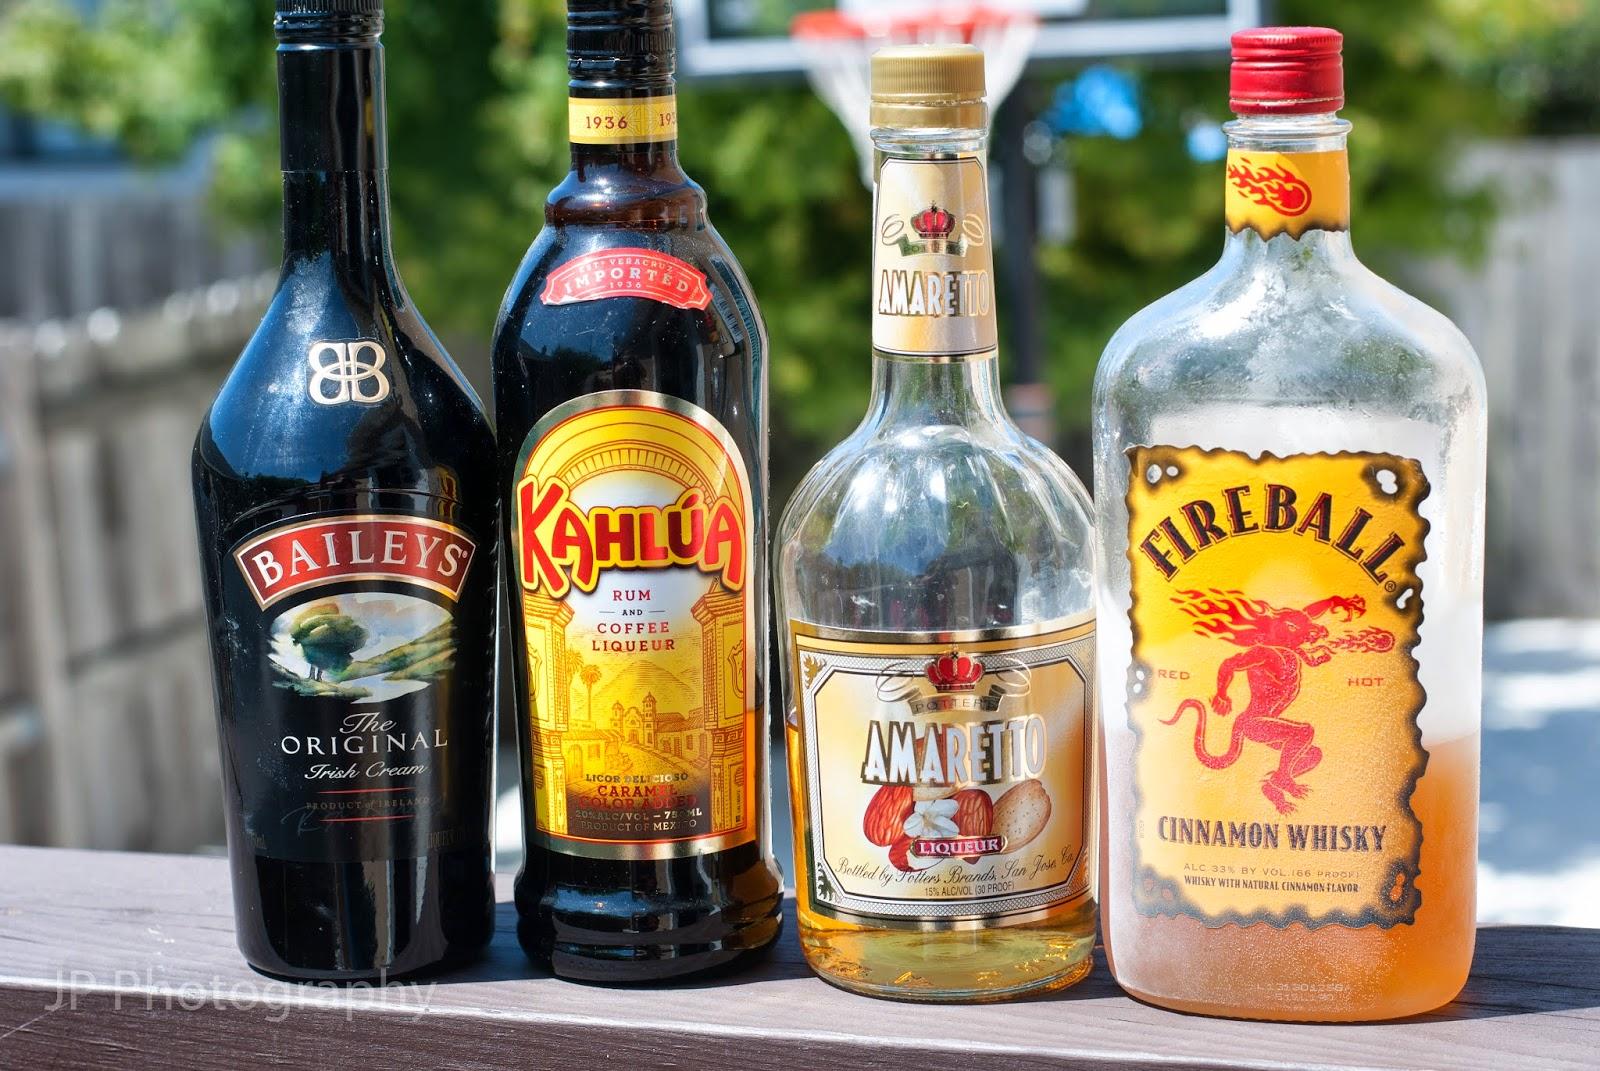 flaming orgasm cocktail, baileys, irish cream liqueur, kahlua, coffee liqueur, fireball whisky, cinnamon whisky, amaretto